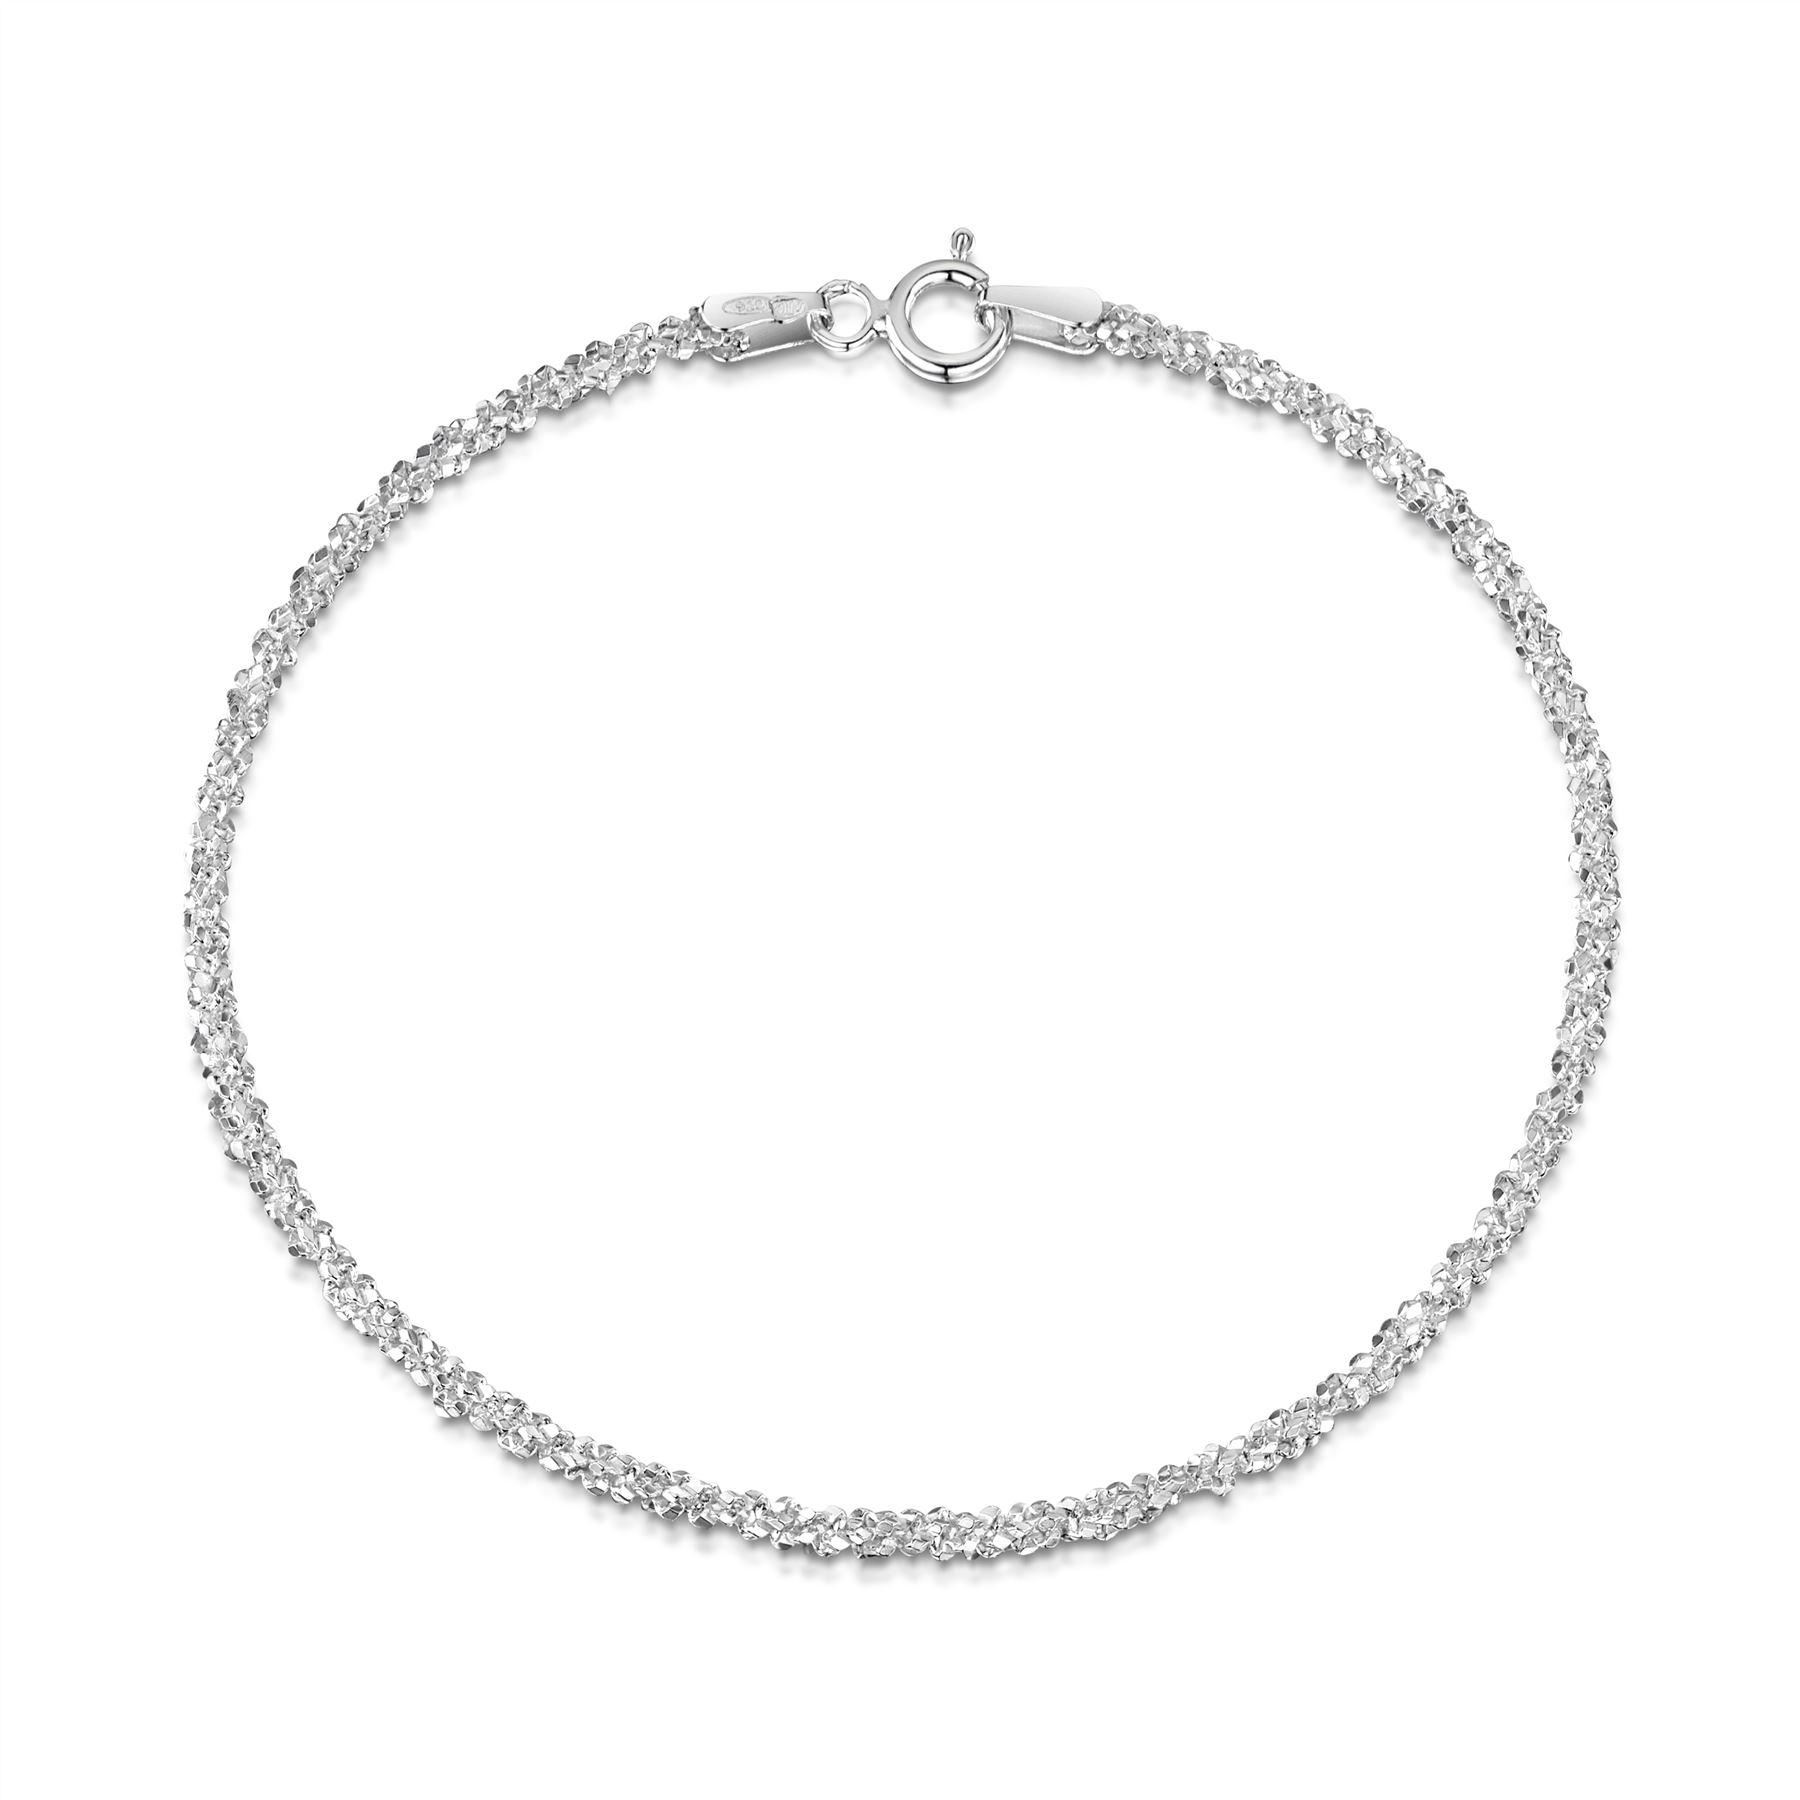 Amberta-Pulsera-en-Autentica-Plata-De-Ley-925-Brazalete-Precioso-para-Mujer miniatura 48